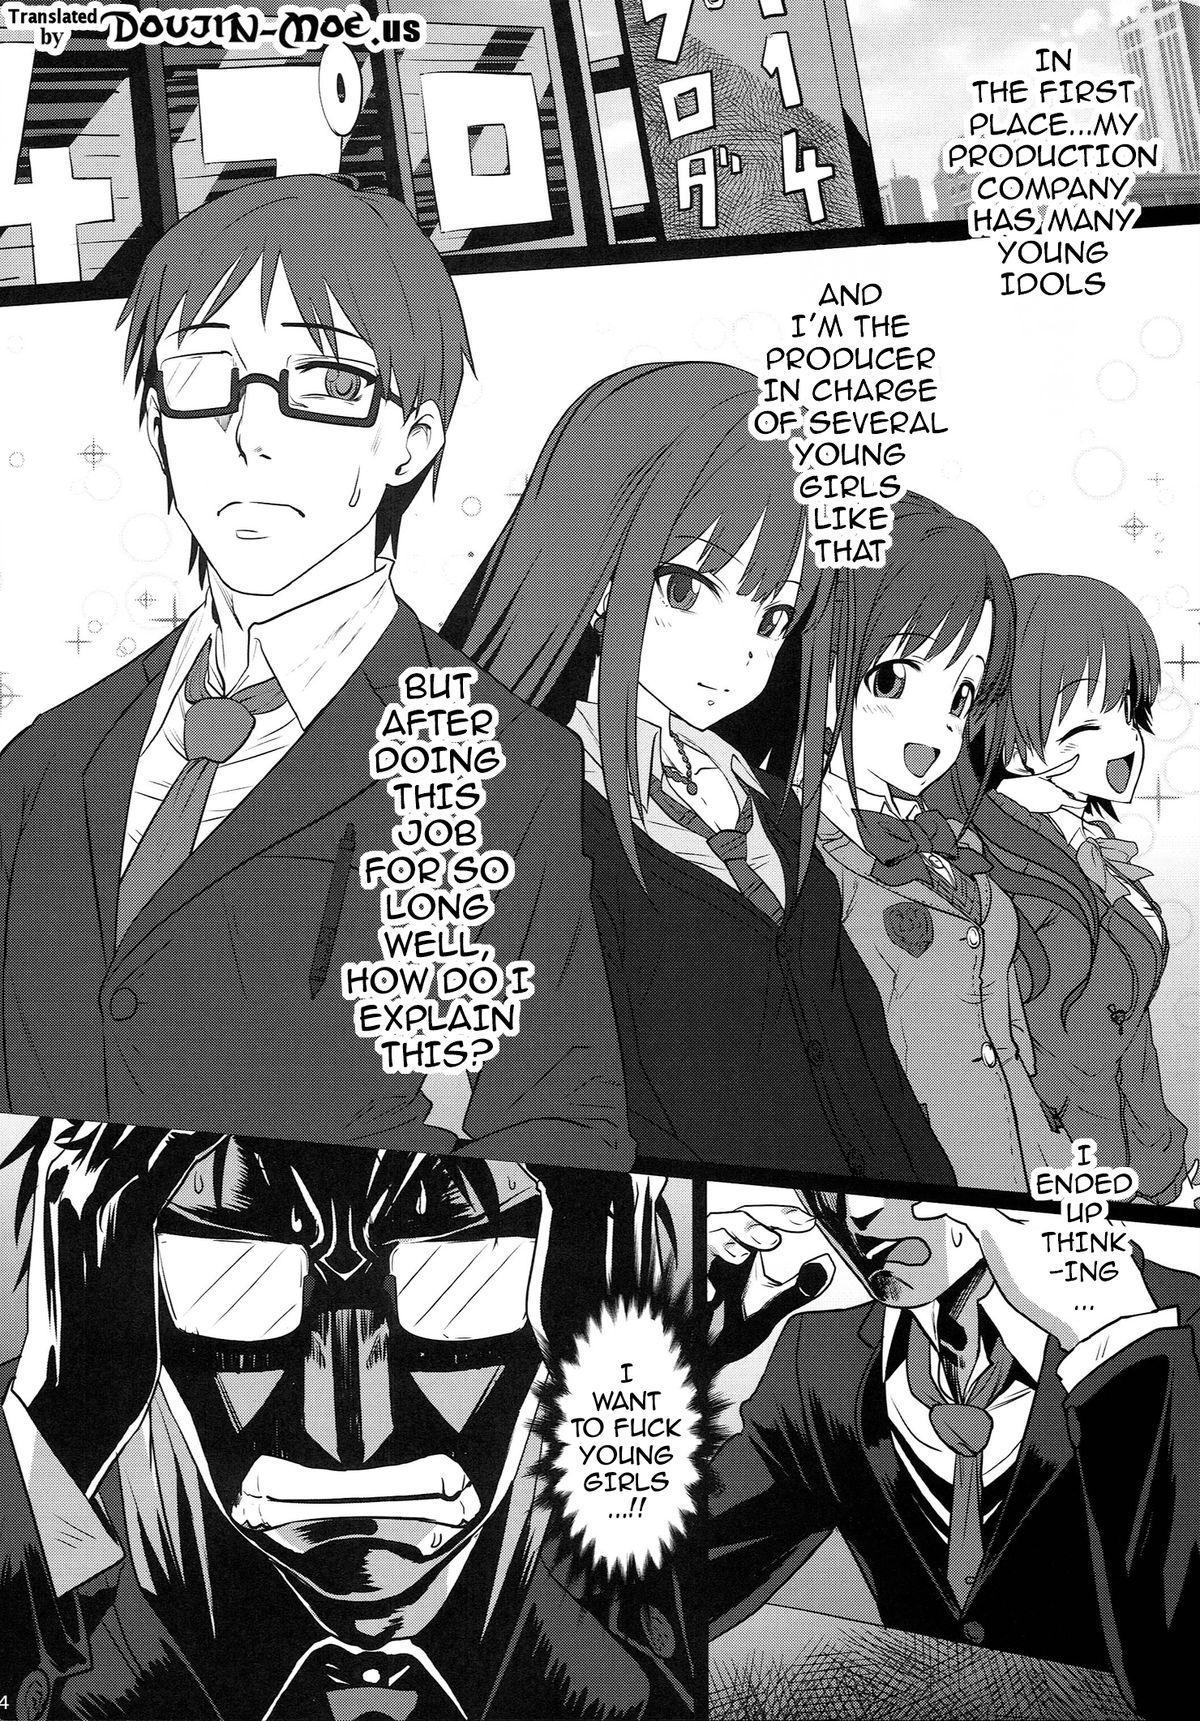 TOKIMEKI Enkou RHYTHM | TOKIMEKI Prostitution RHYTHM 2